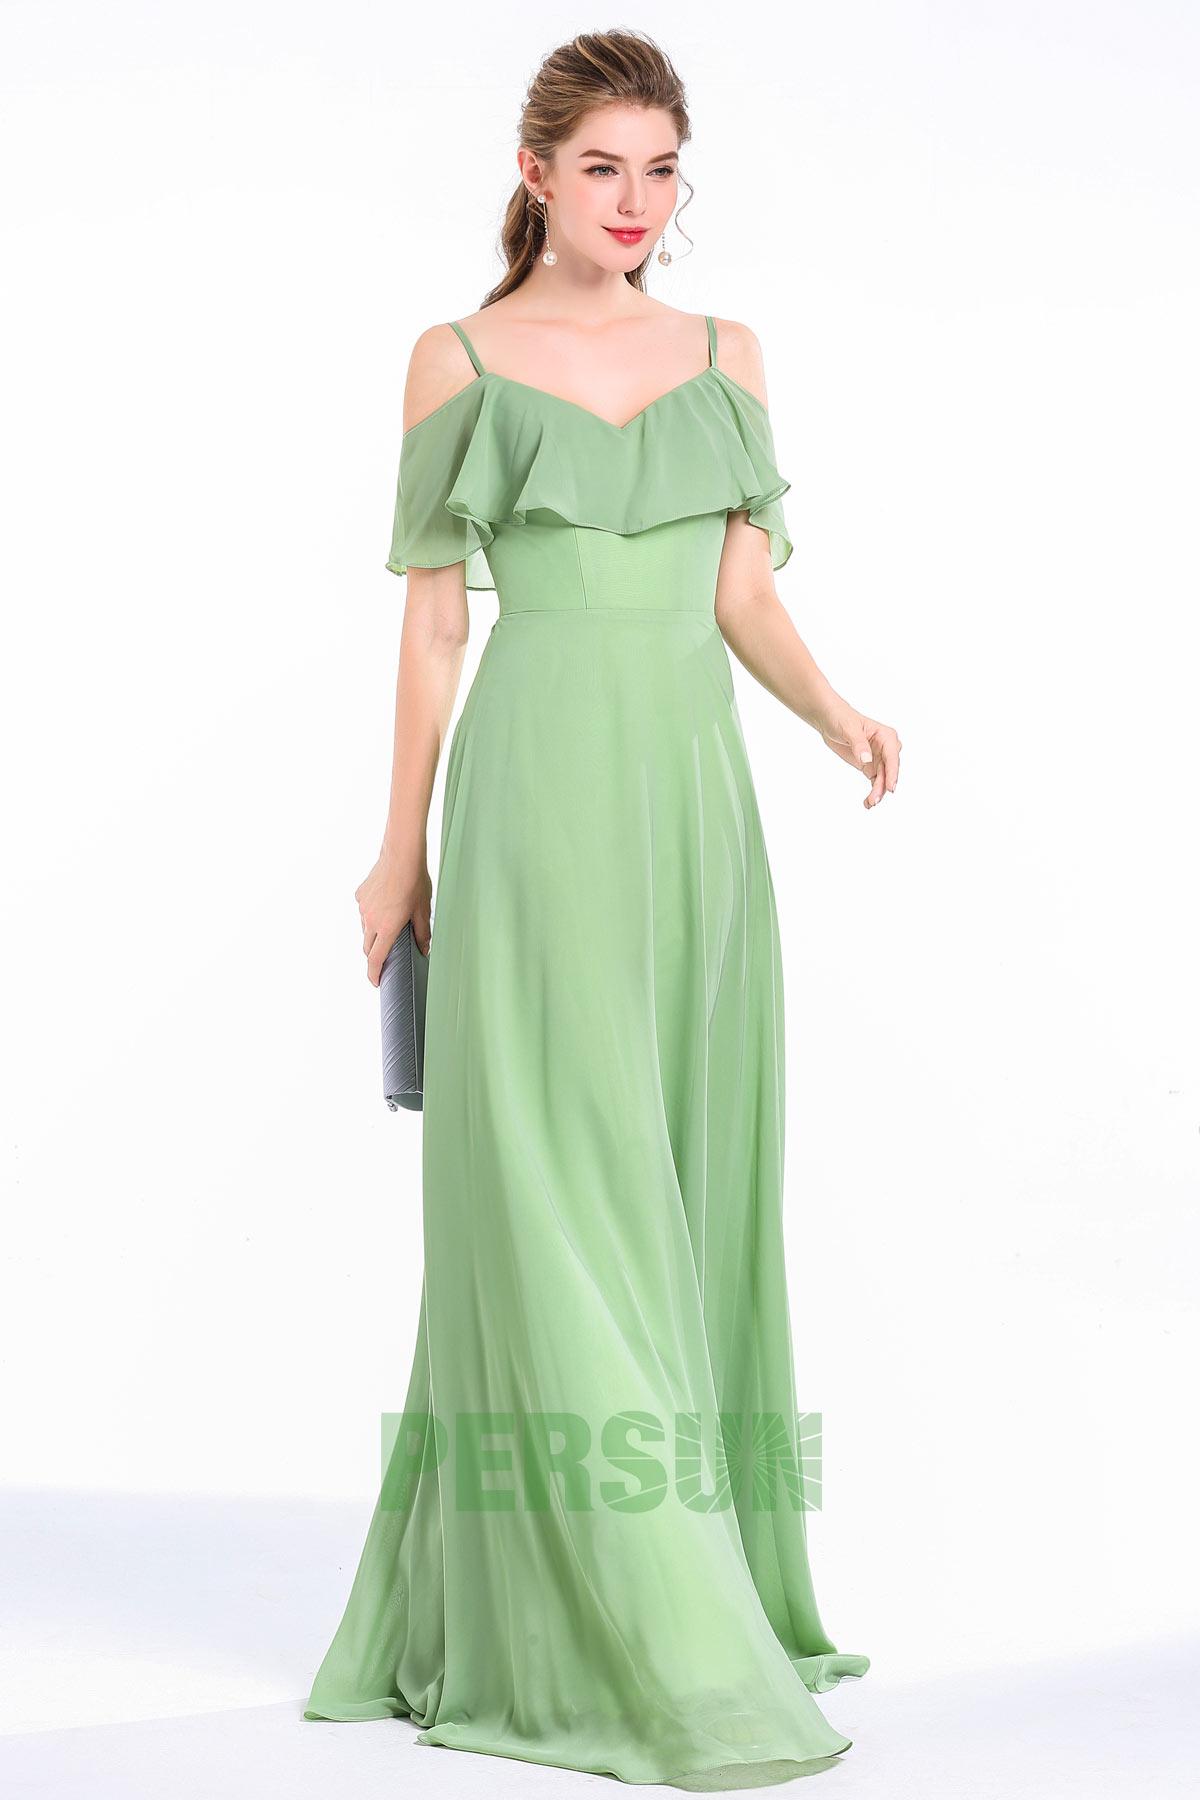 f9a0f77edb7 Robe longue vert greenery à haut volants pour cortège mariage ...